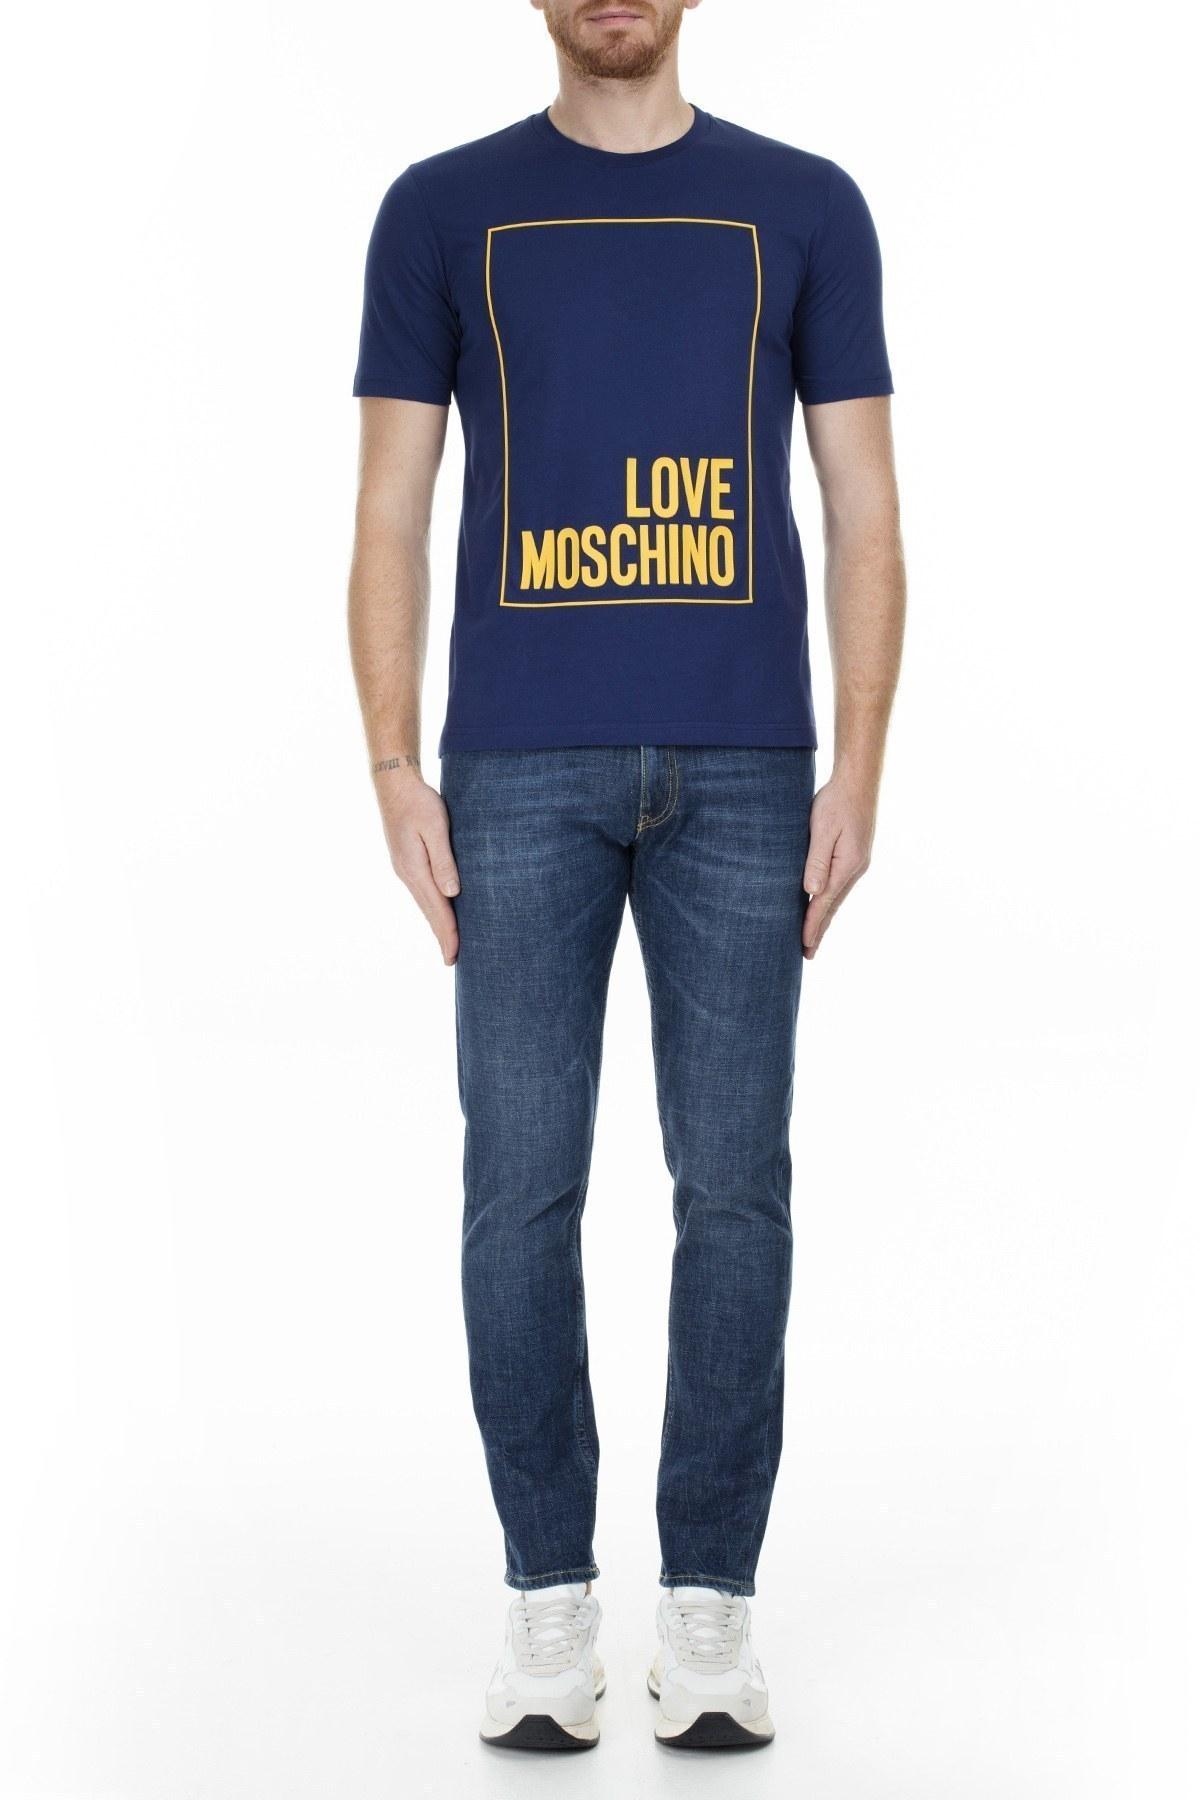 Love Moschino Erkek T Shirt S M47322RM3876 Y56 LACİVERT